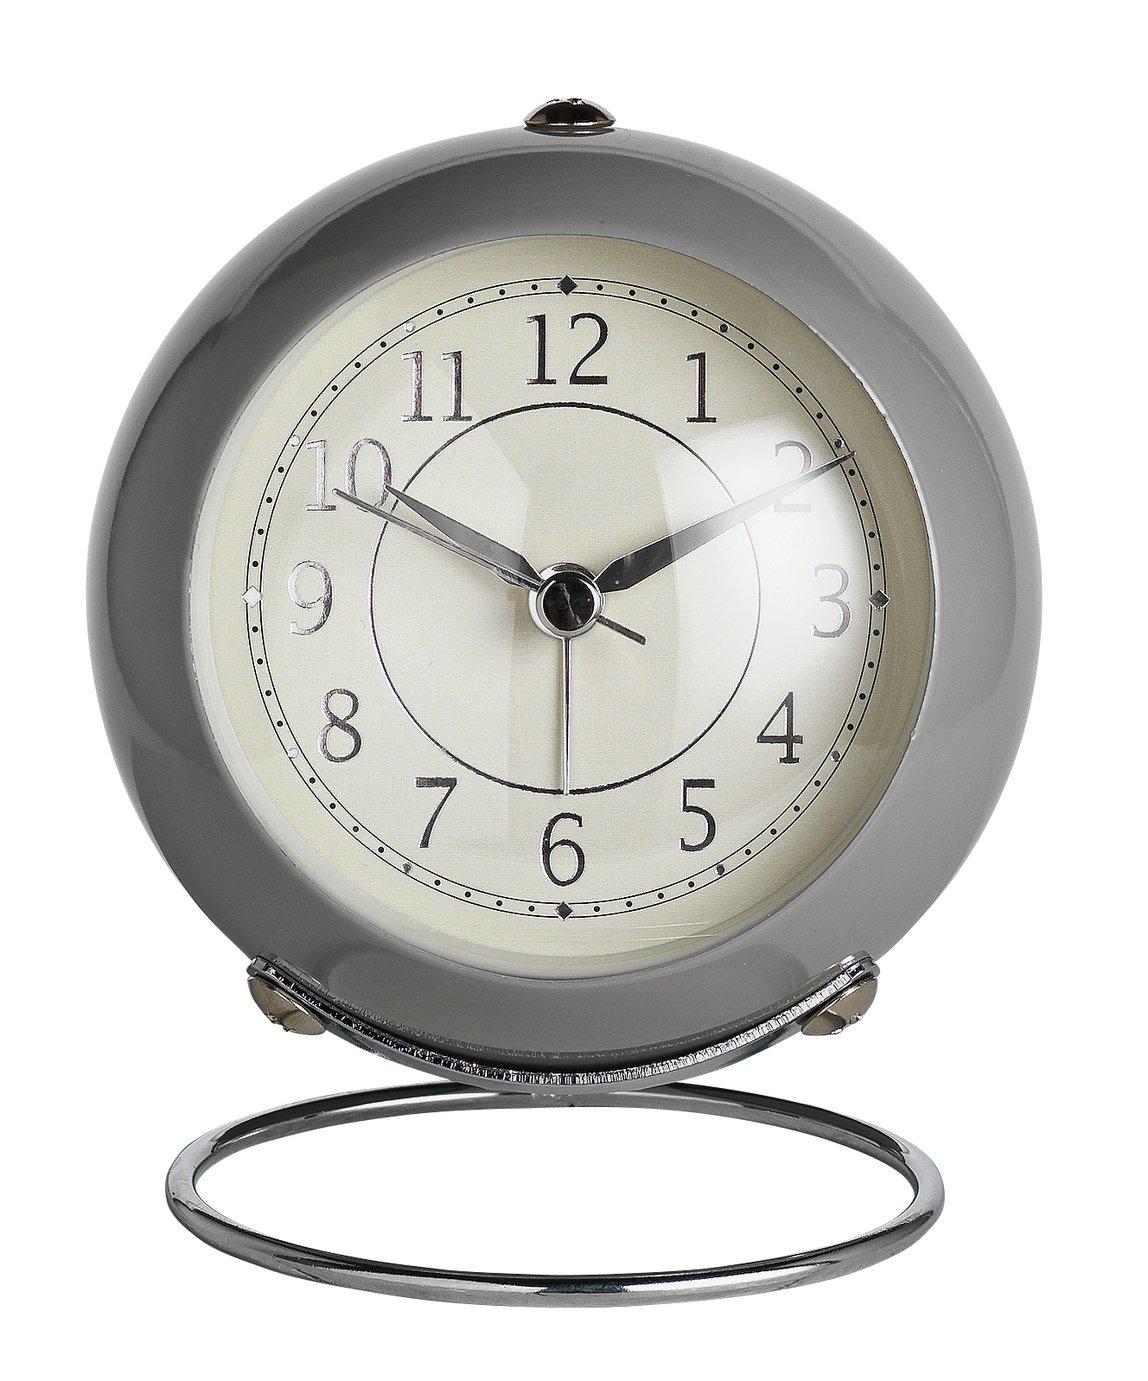 Wm. Widdop Alarm Clock - Silver & Grey